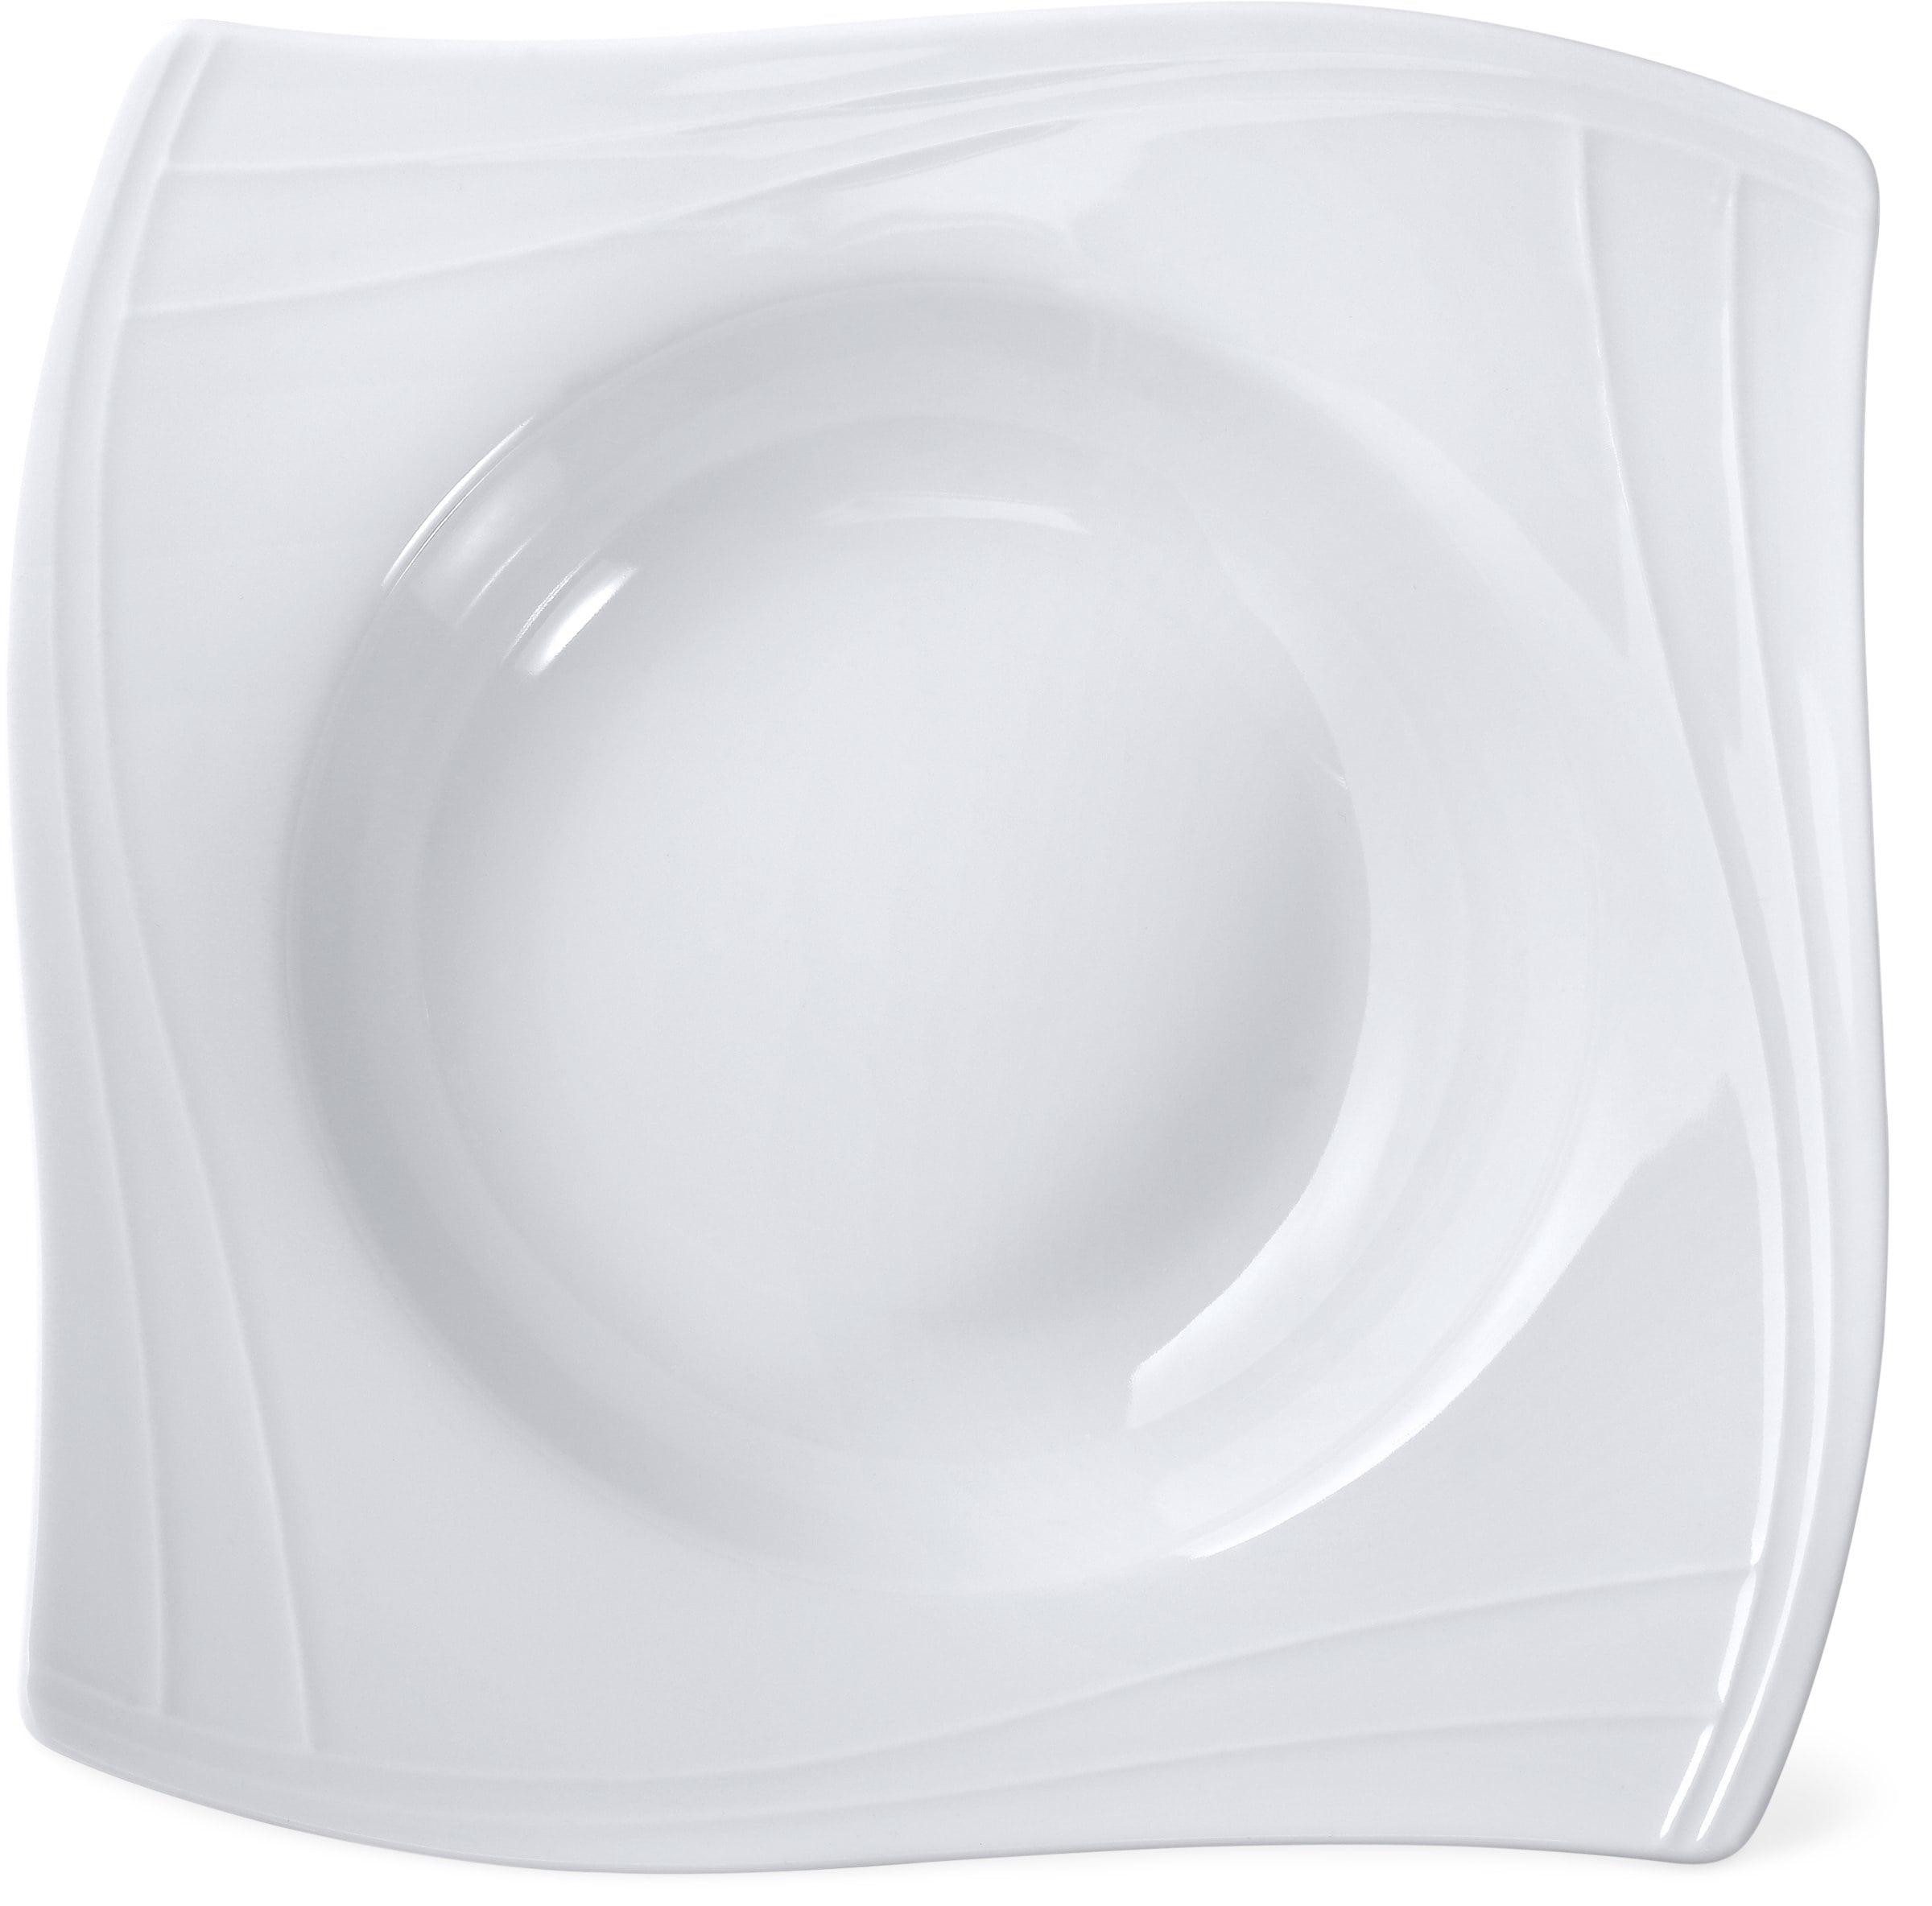 Cucina & Tavola VANITY Pastateller